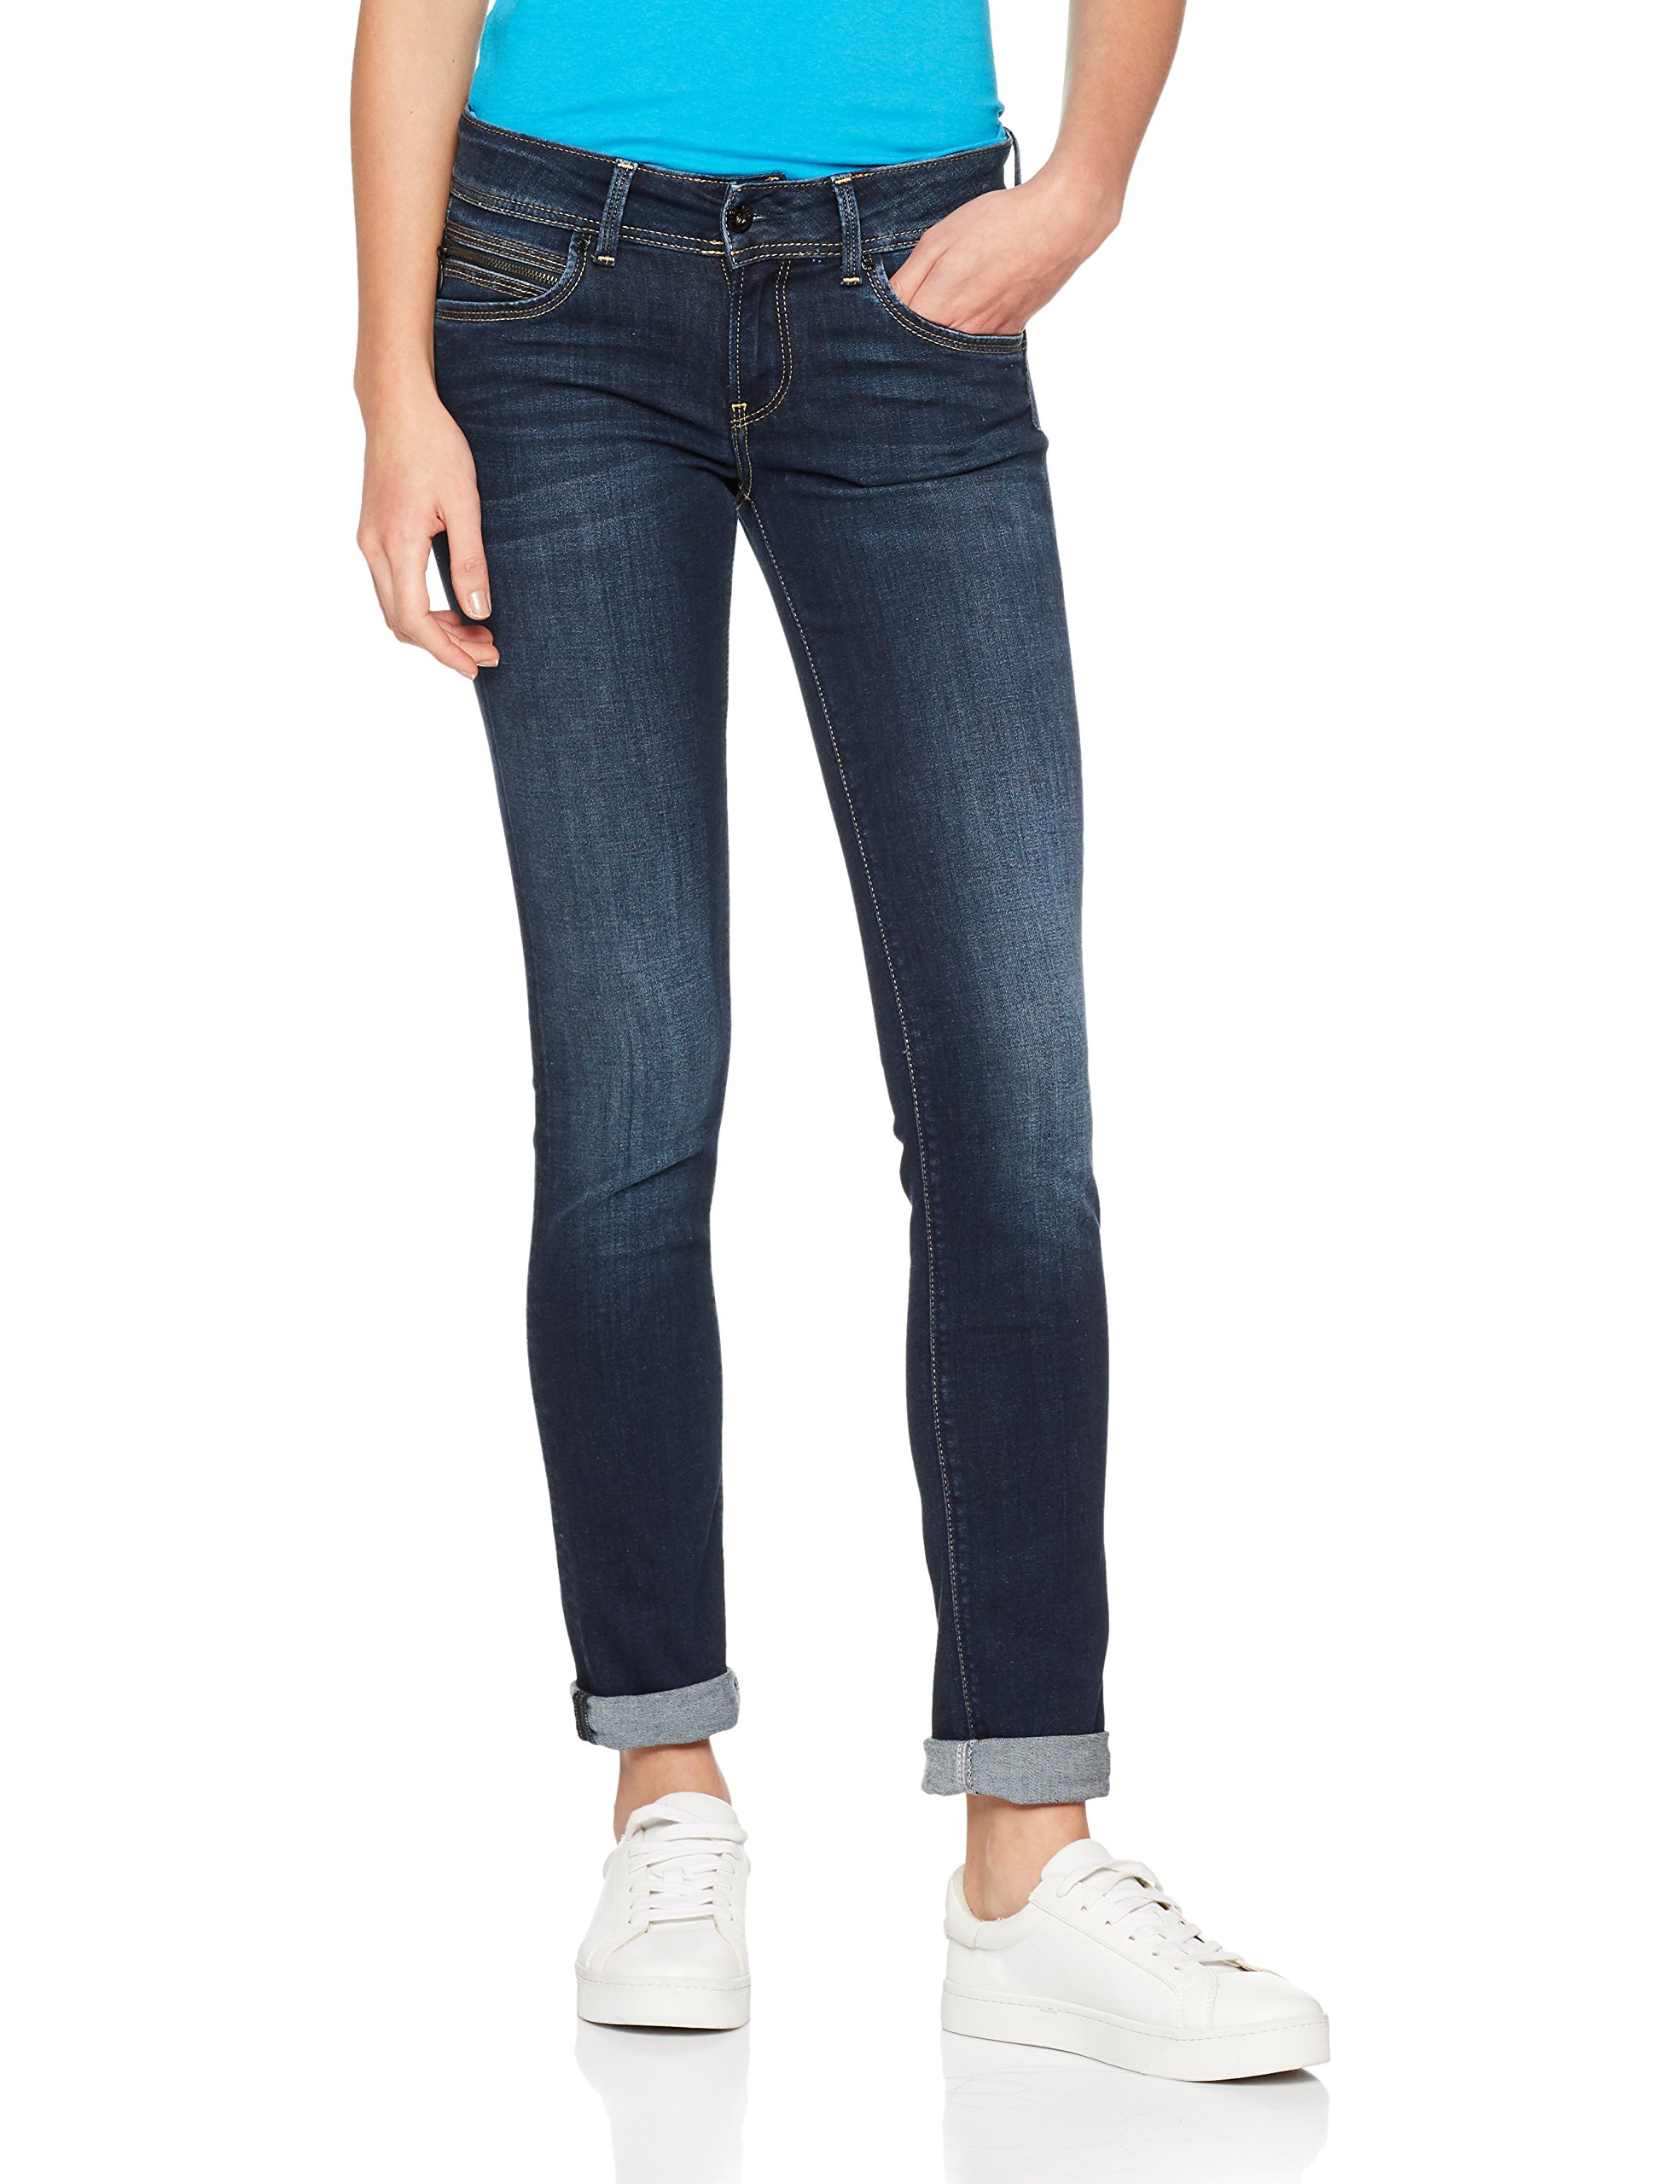 Jeans New Ultra BrookeFemme Stretch Denim10oz DkW32 l30 Pepe DH9IYWE2